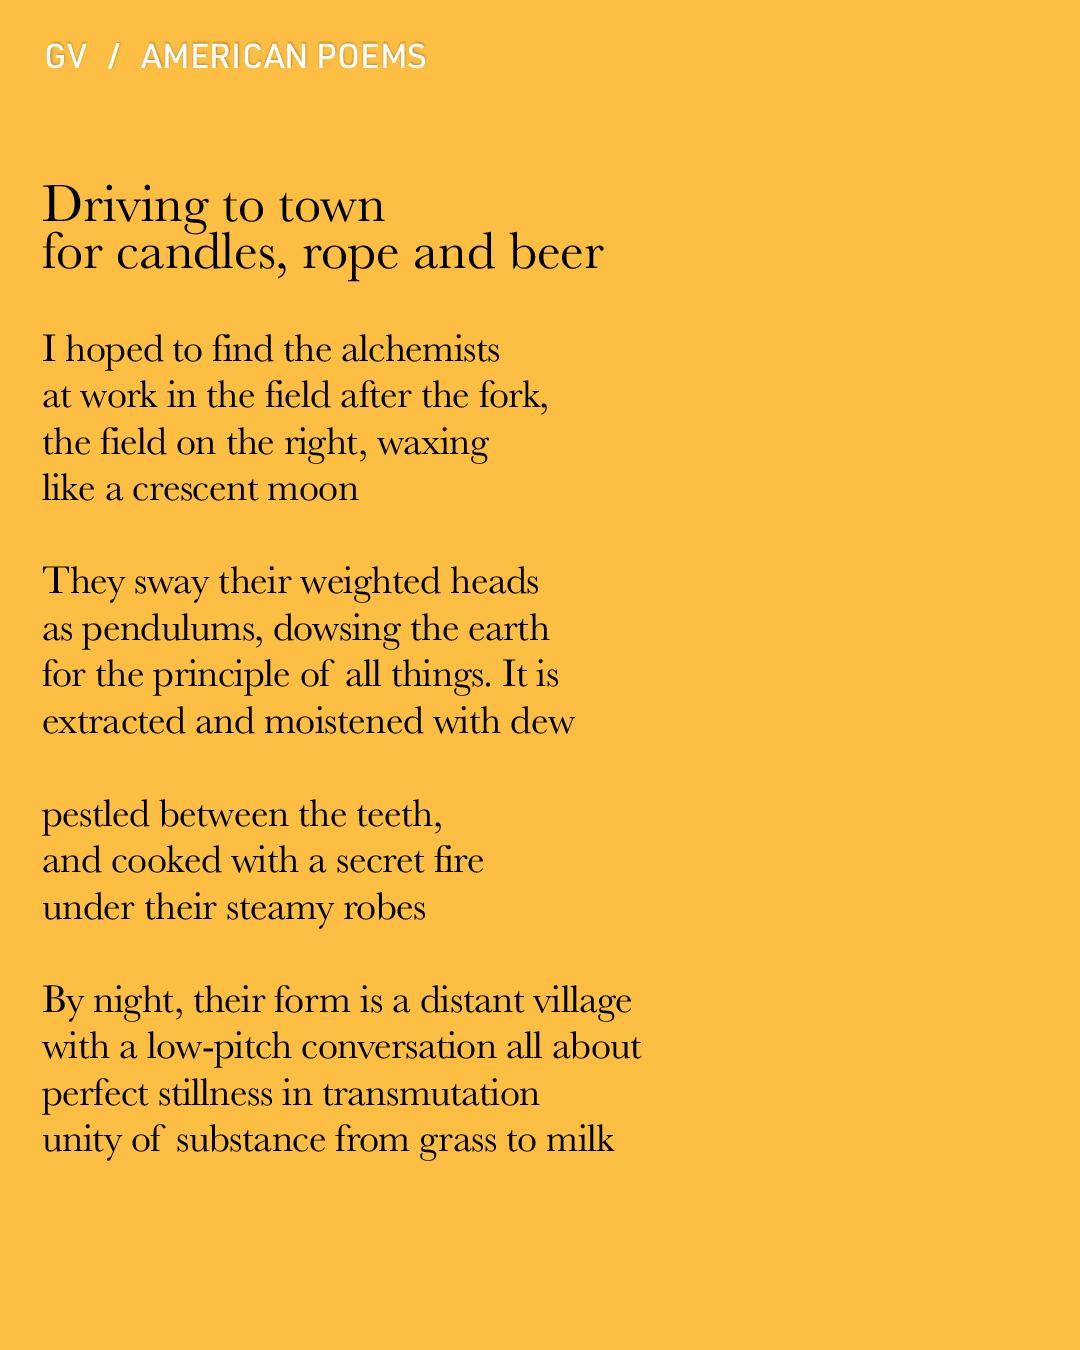 Gvion-PoemsA-Driving.jpg